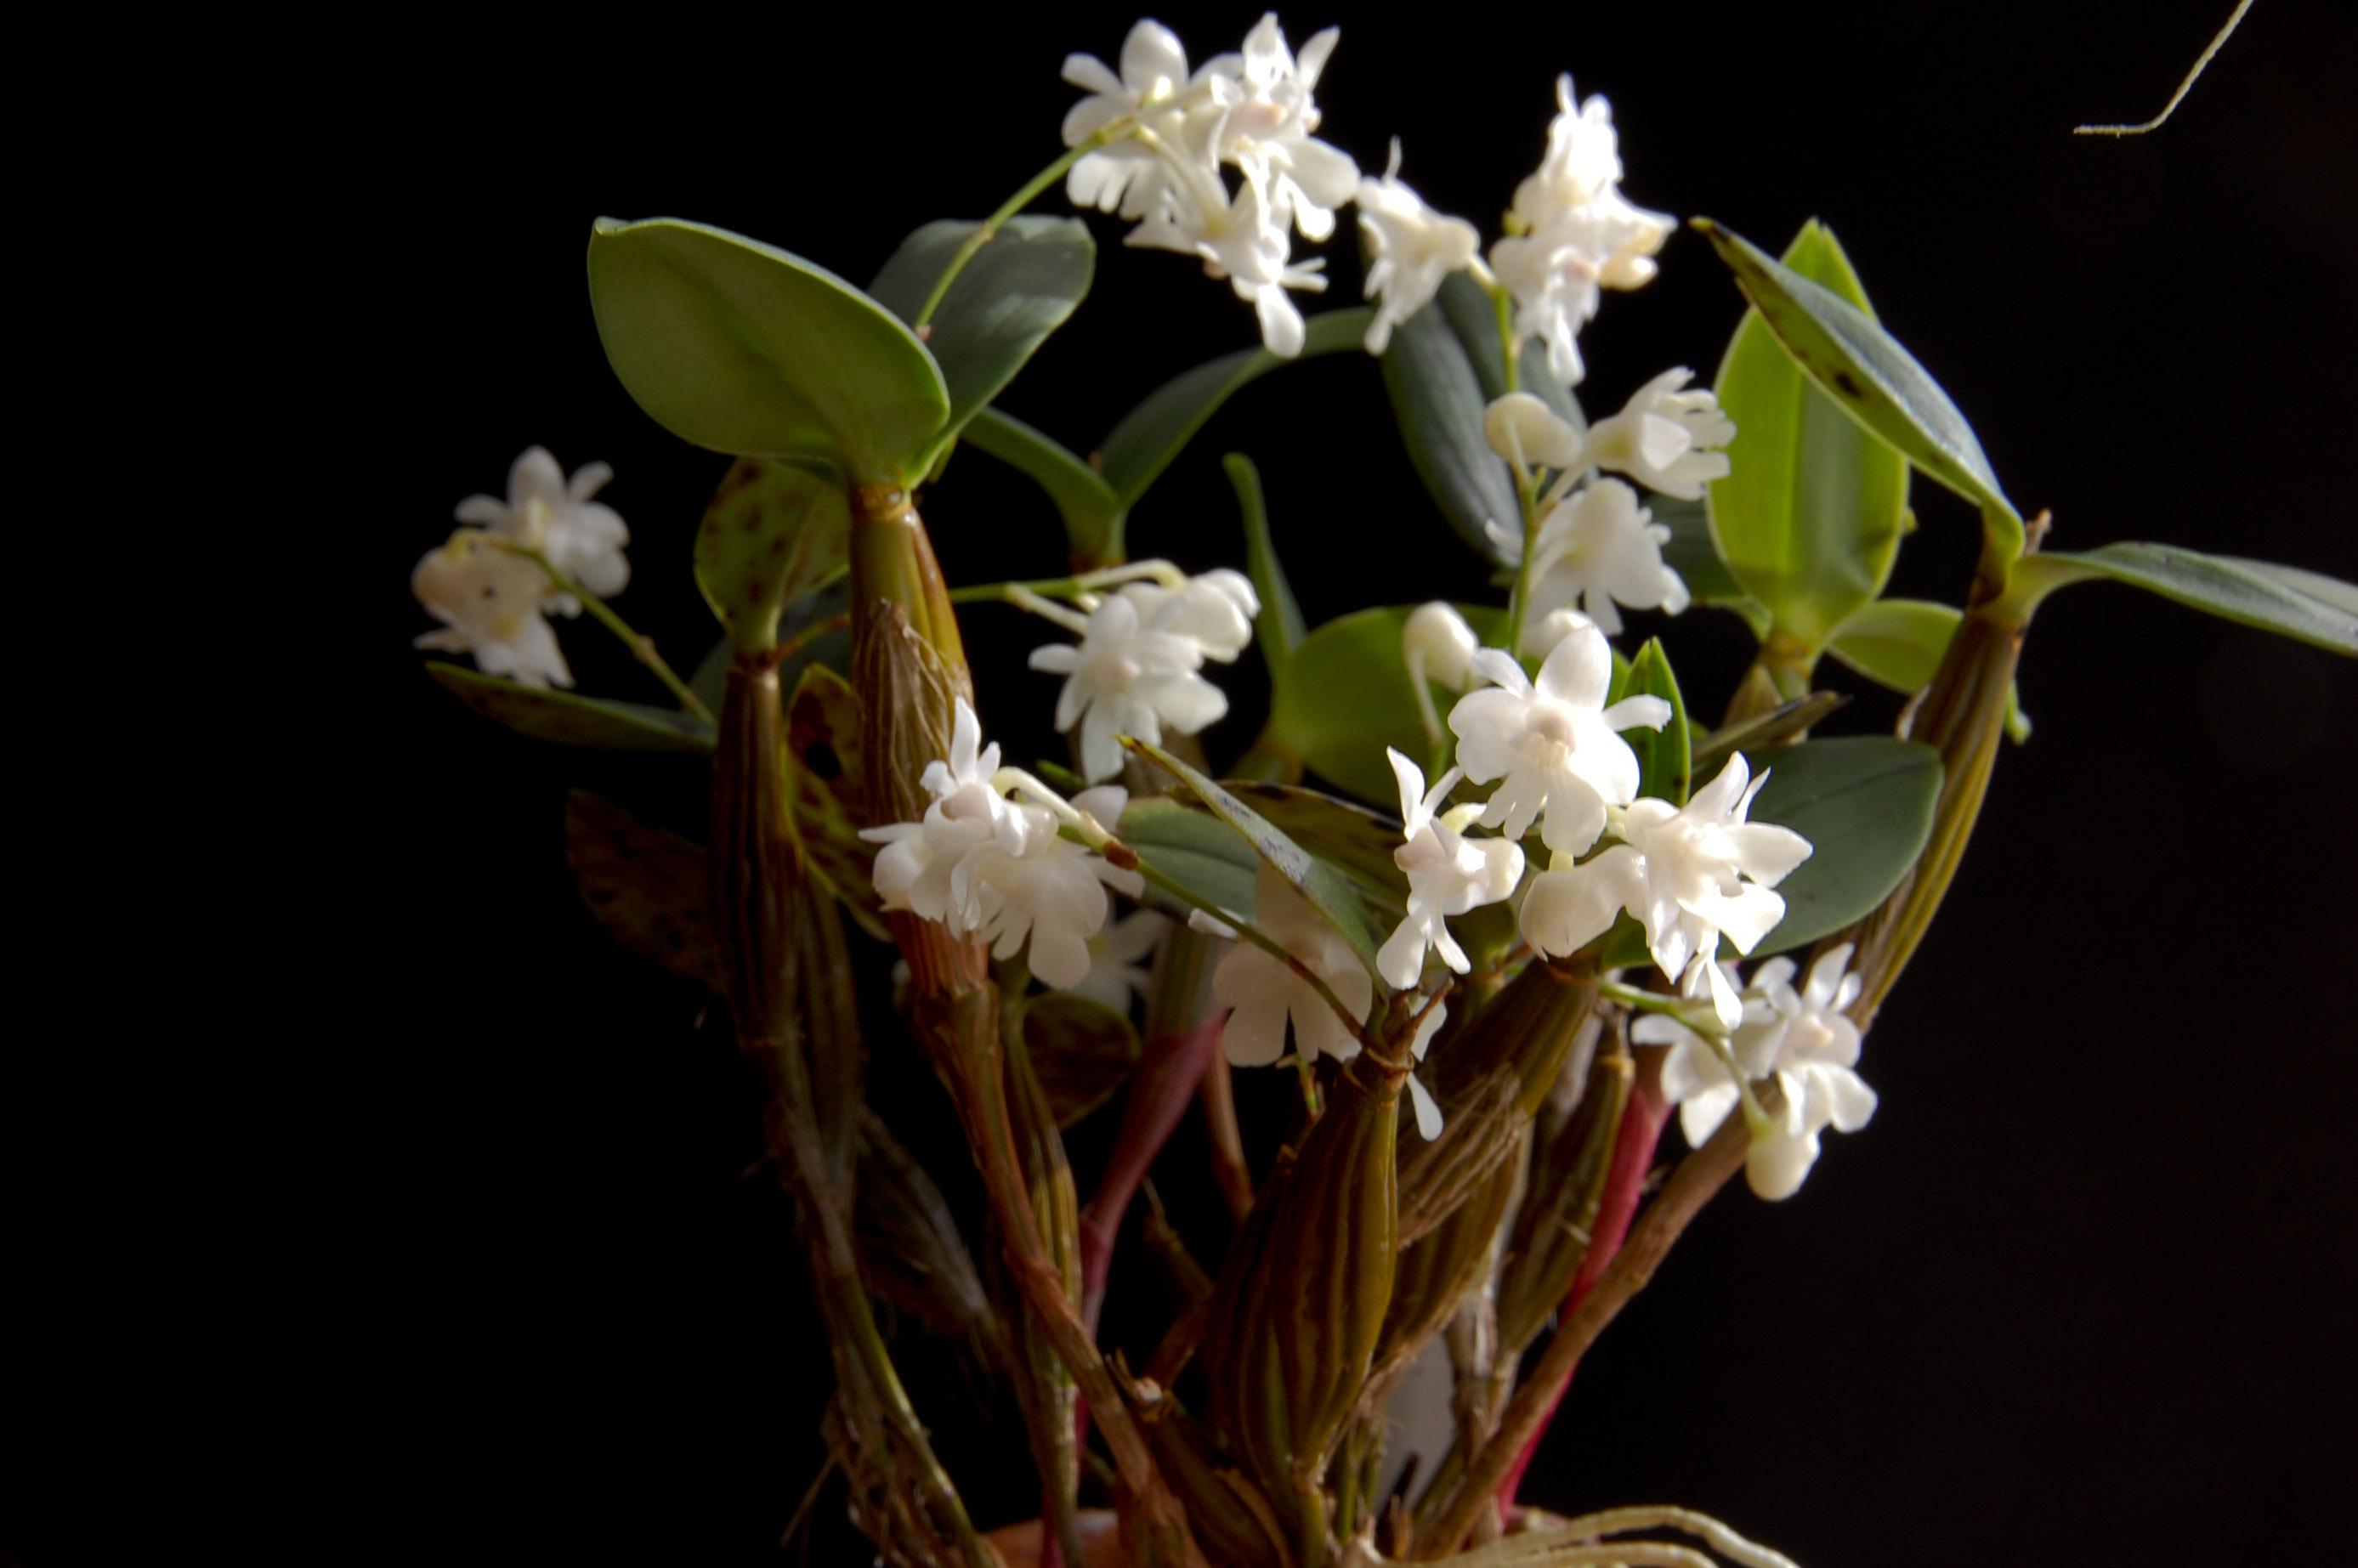 http://upload.wikimedia.org/wikipedia/commons/f/f5/Dendrobium_aberrans.jpg